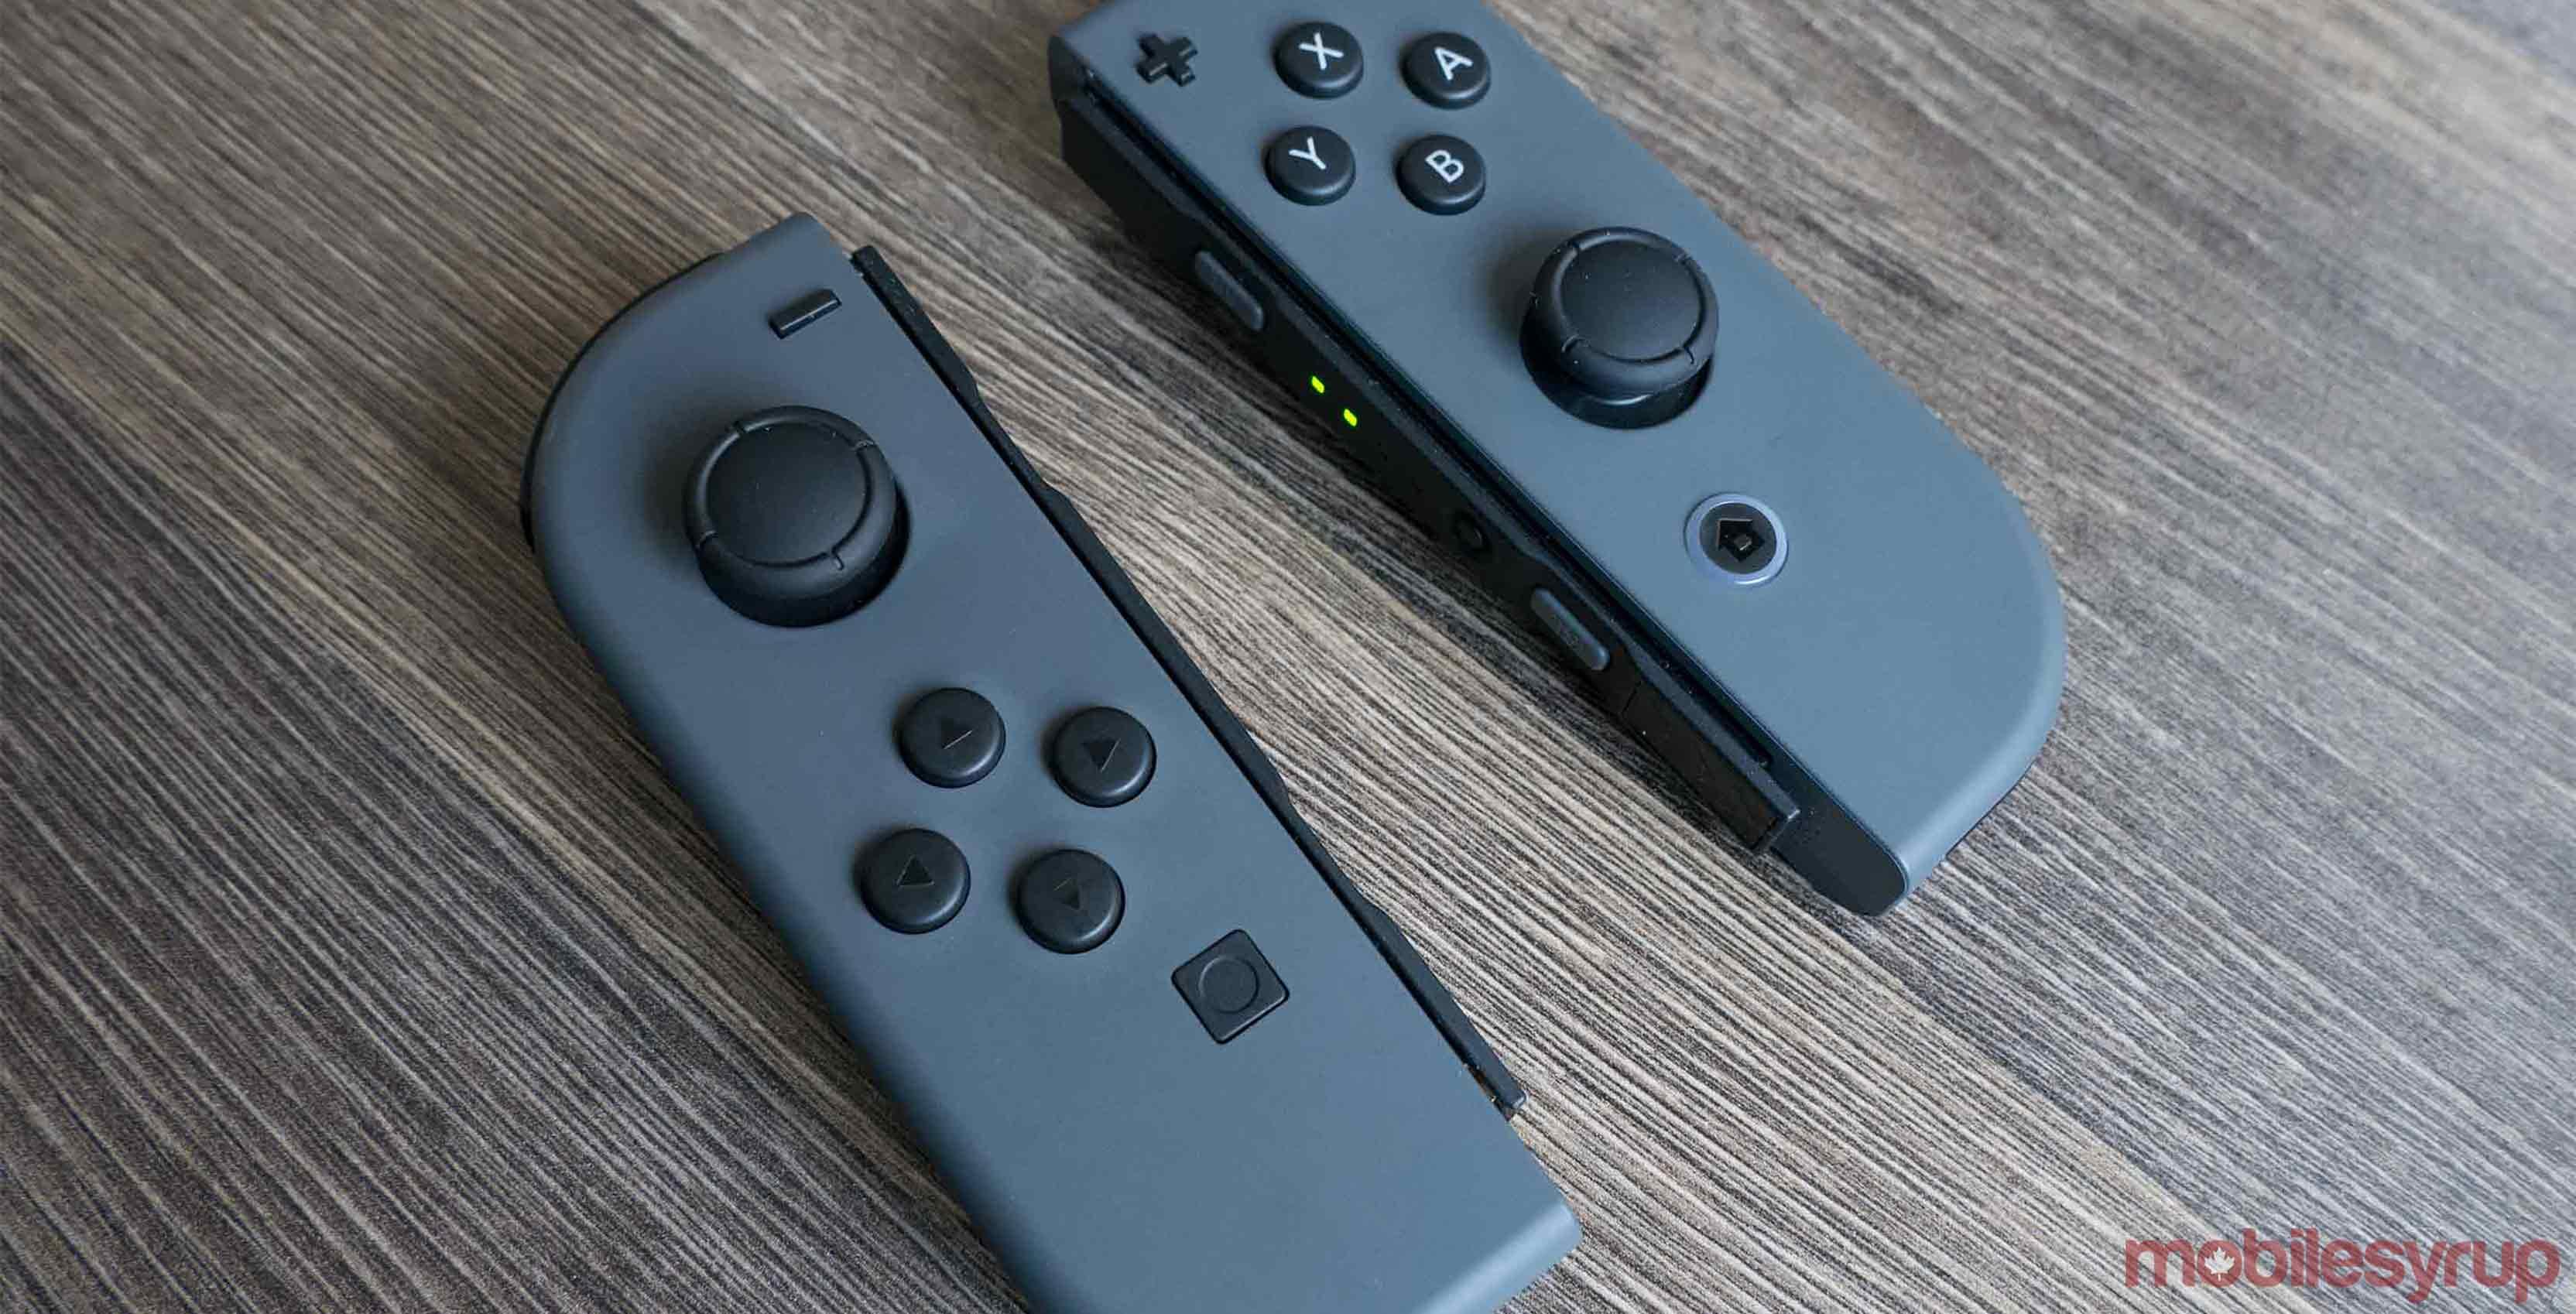 Nintendo Switch Joy-Con controllers - Nintendo responds to Switch Joy-con controller connectivity issues